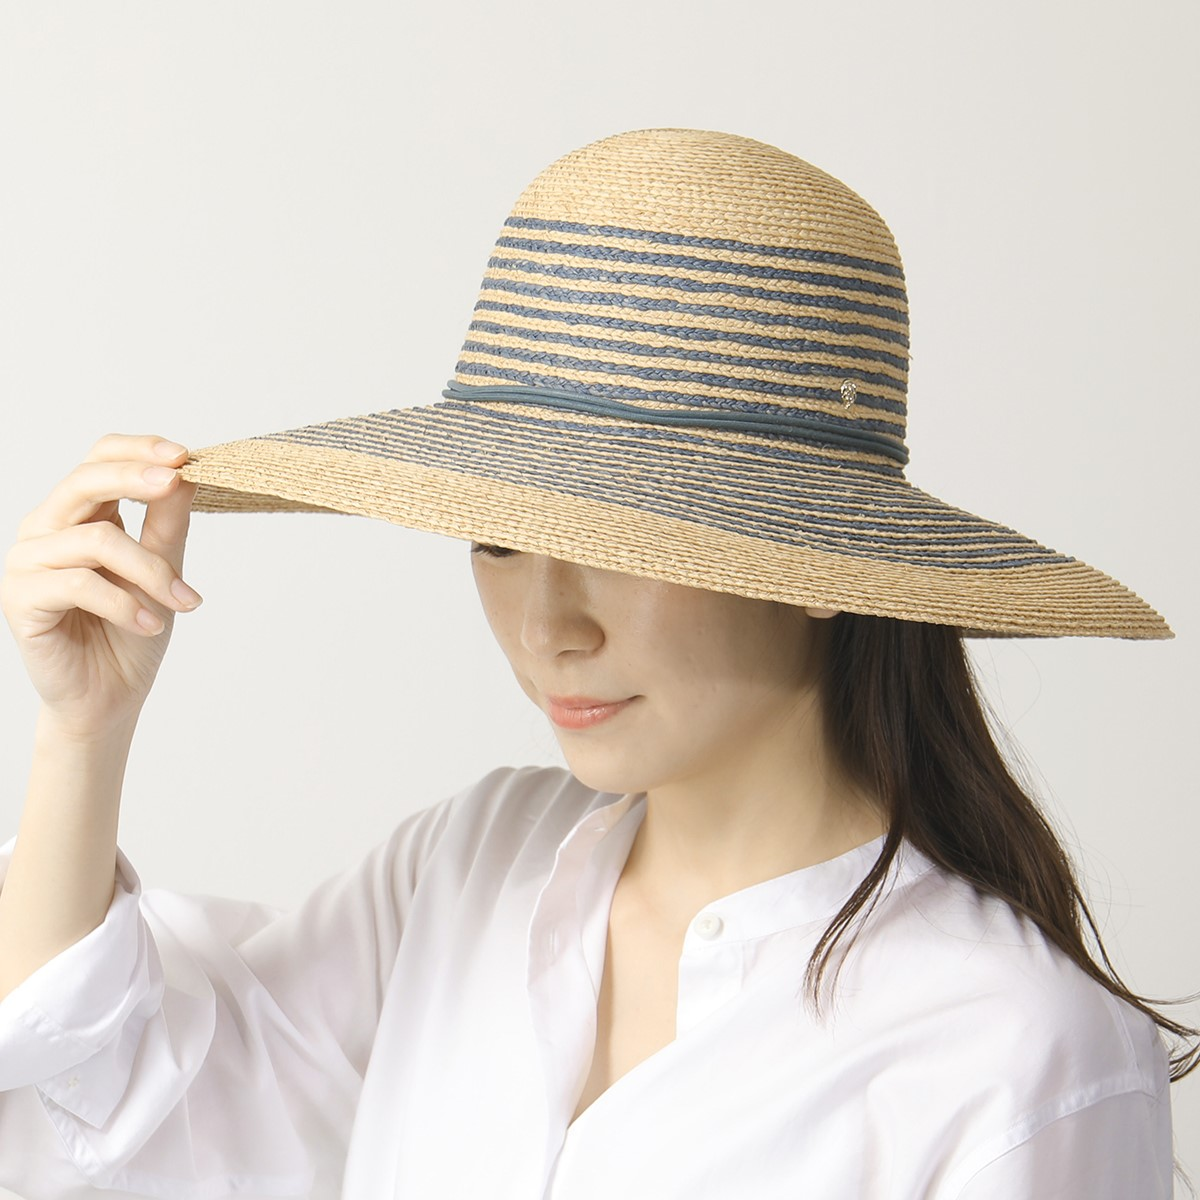 HELEN KAMINSKI ヘレンカミンスキー Tallulah ラフィア ハット ラウンドクラウンハット 帽子 ツバ広 Natural/MistyLake レディース